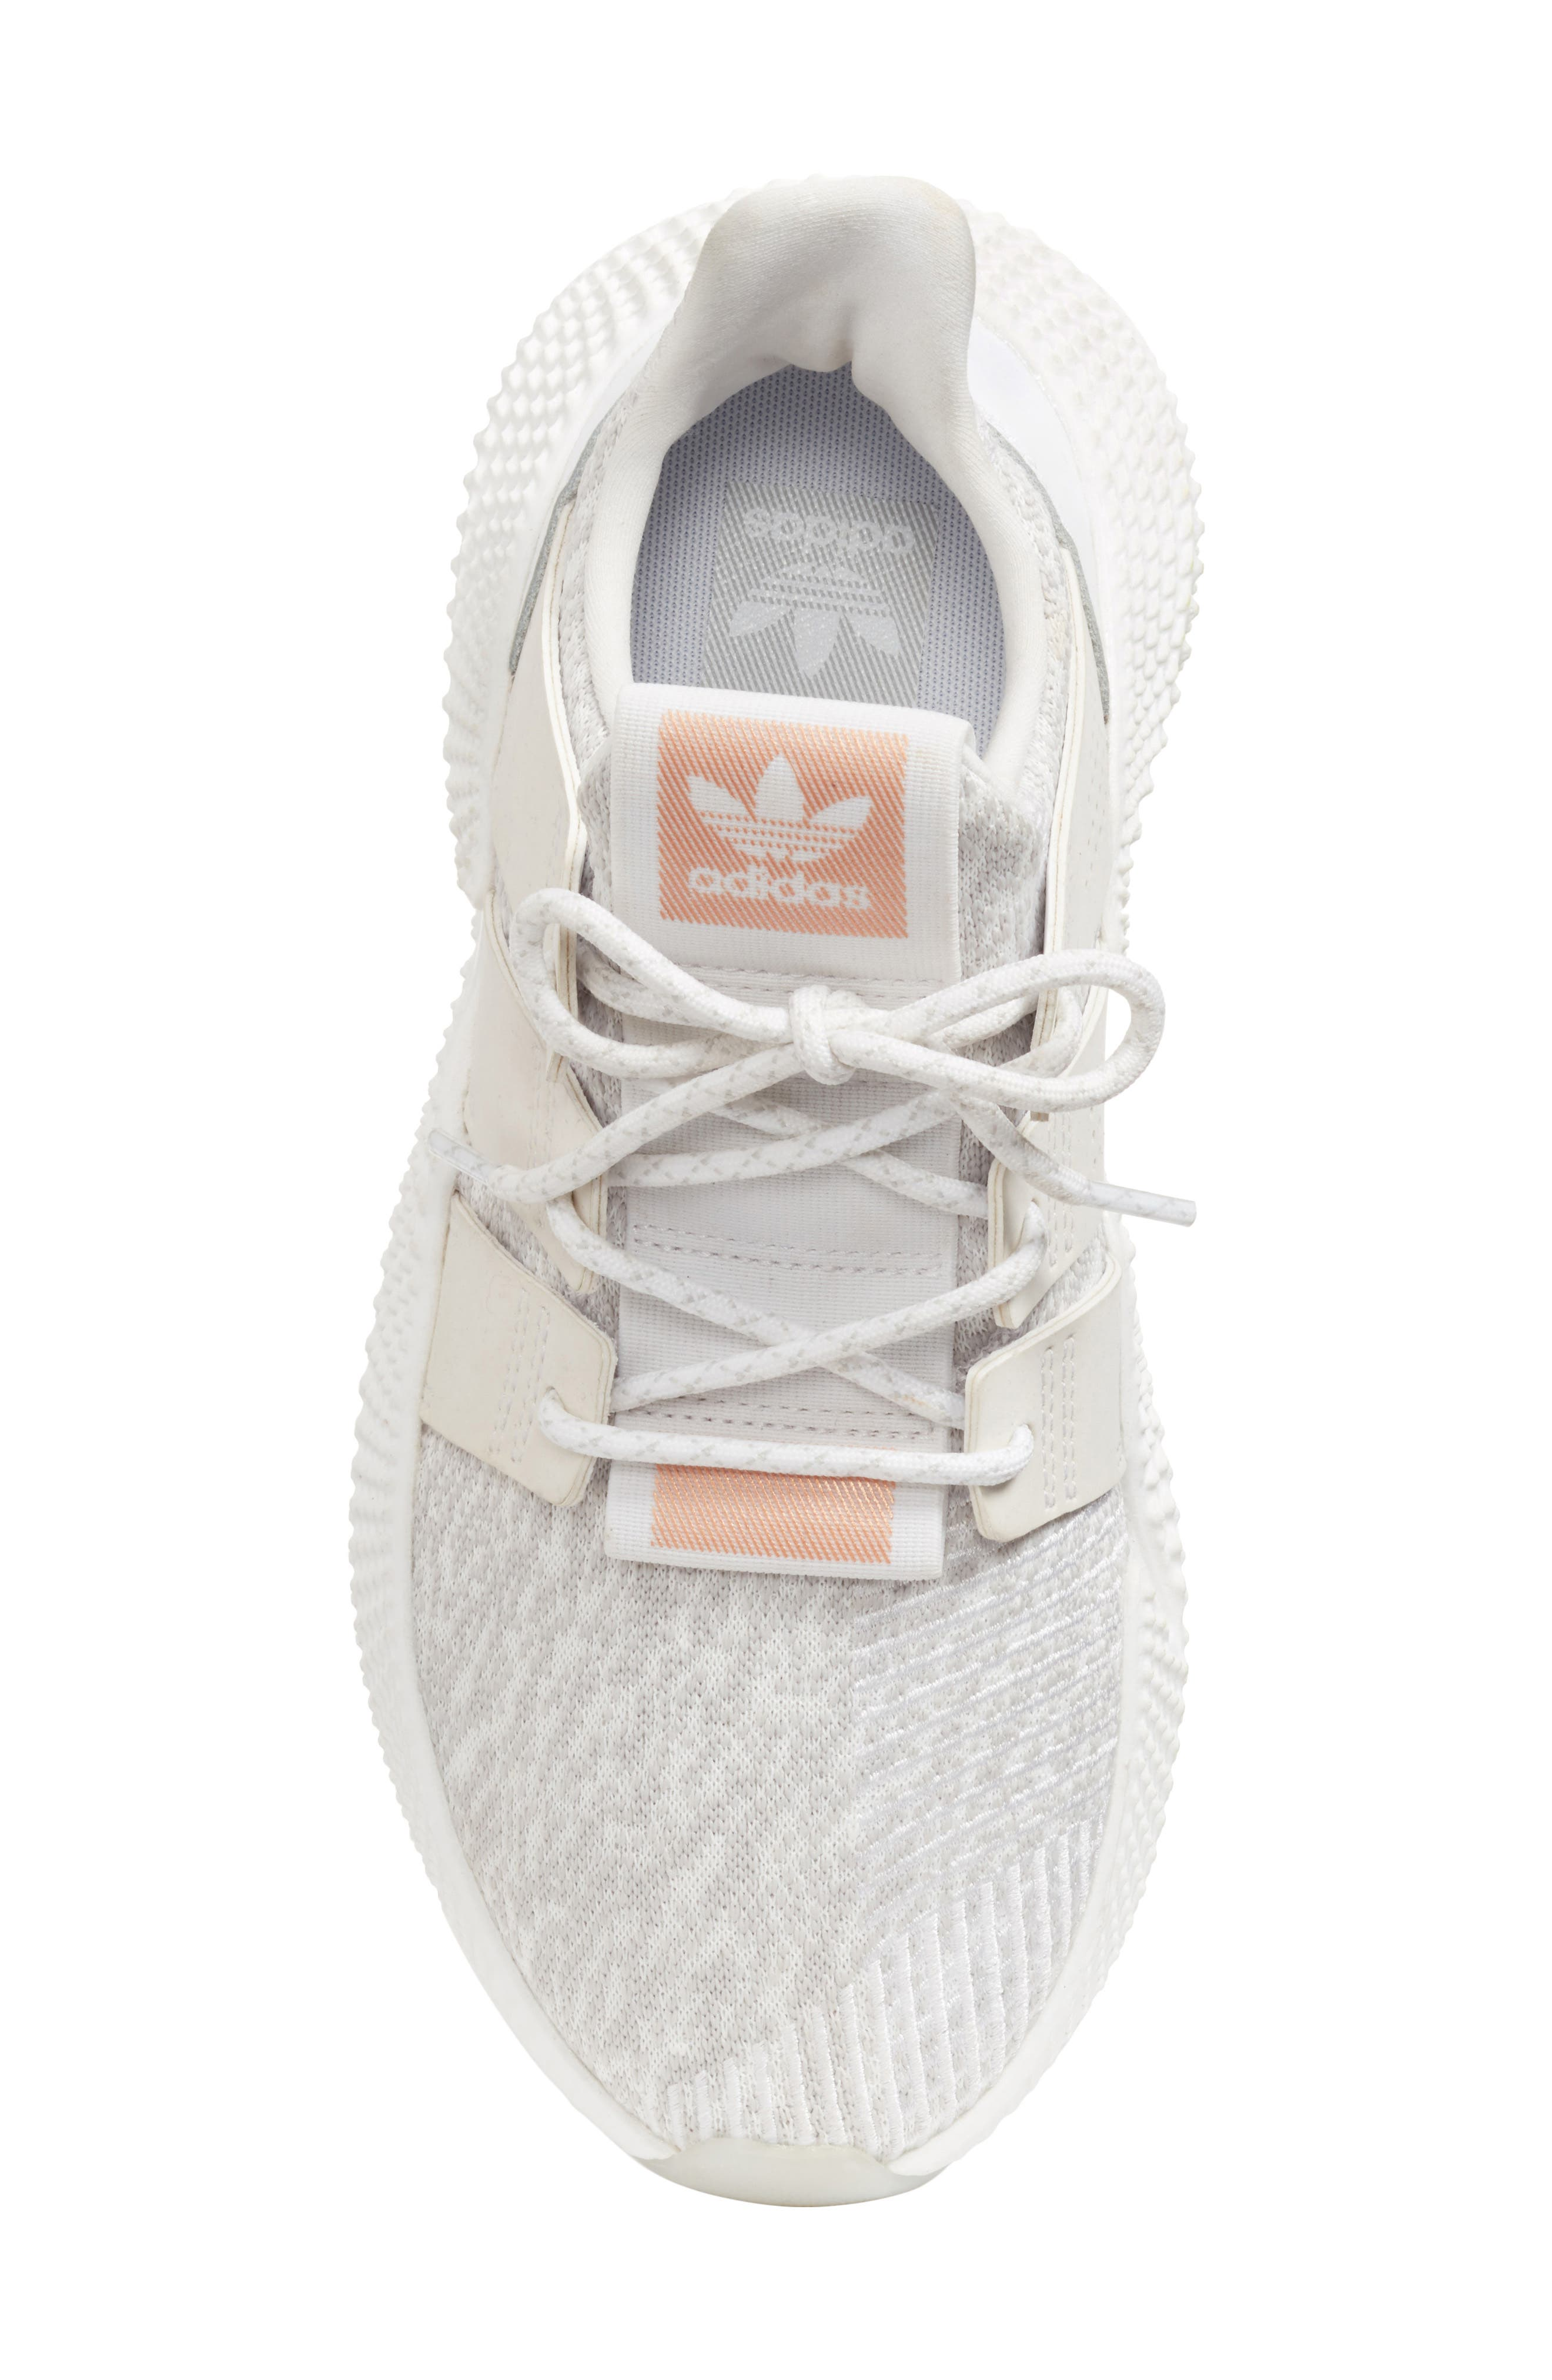 Prophere Sneaker,                             Alternate thumbnail 5, color,                             White/ White/ Supplier Colour